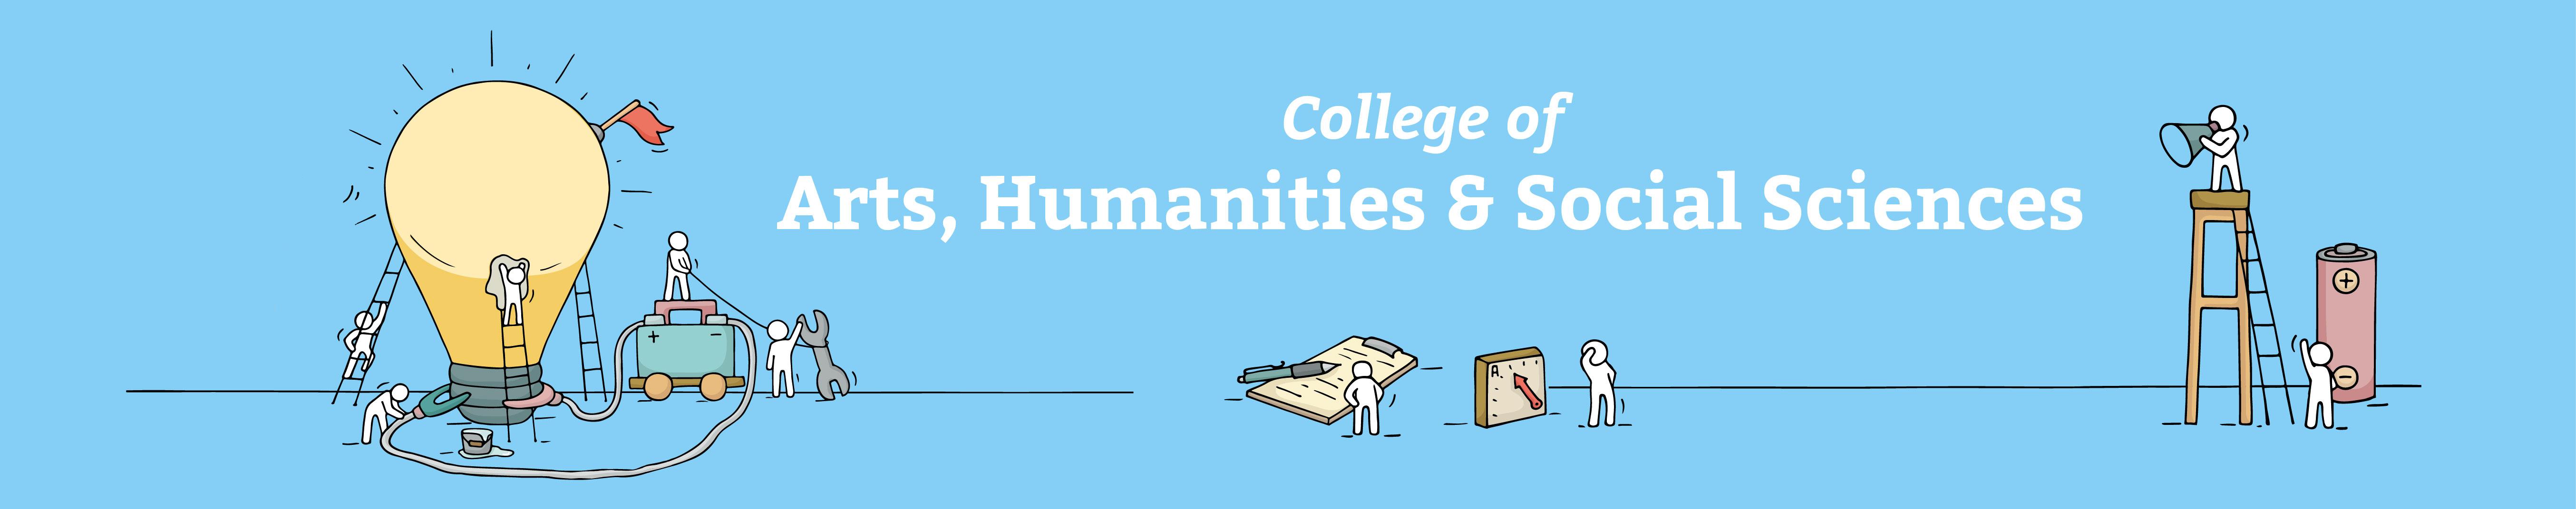 College of Arts, Humanities & Social Sciences